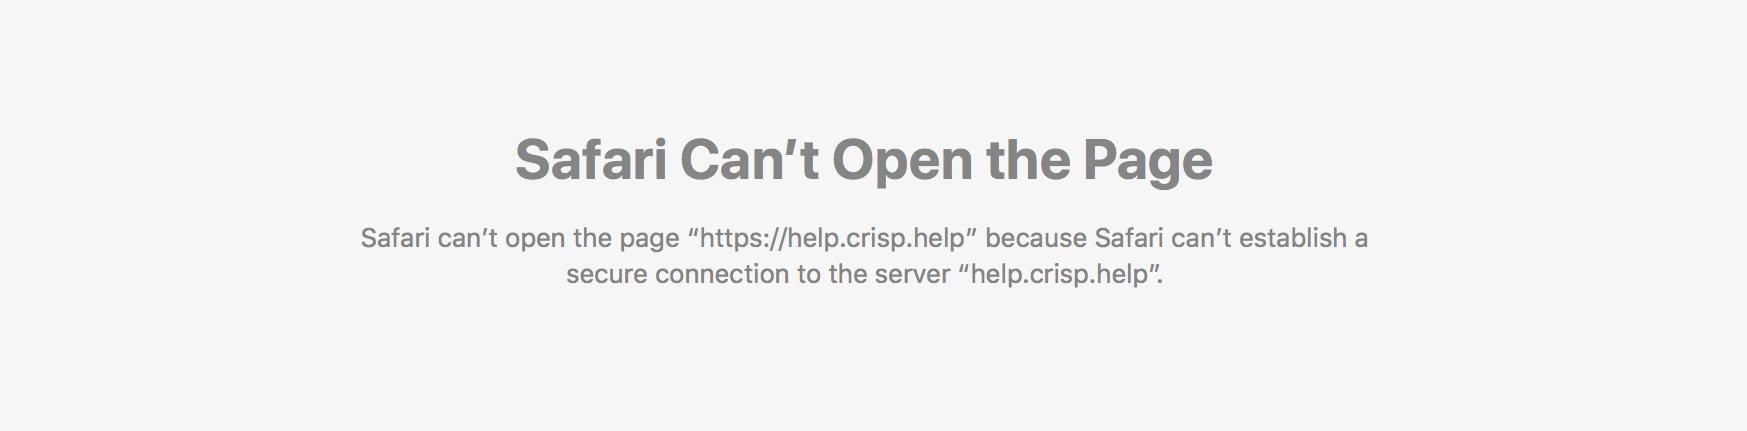 Helpdesk SSL warning for a domain